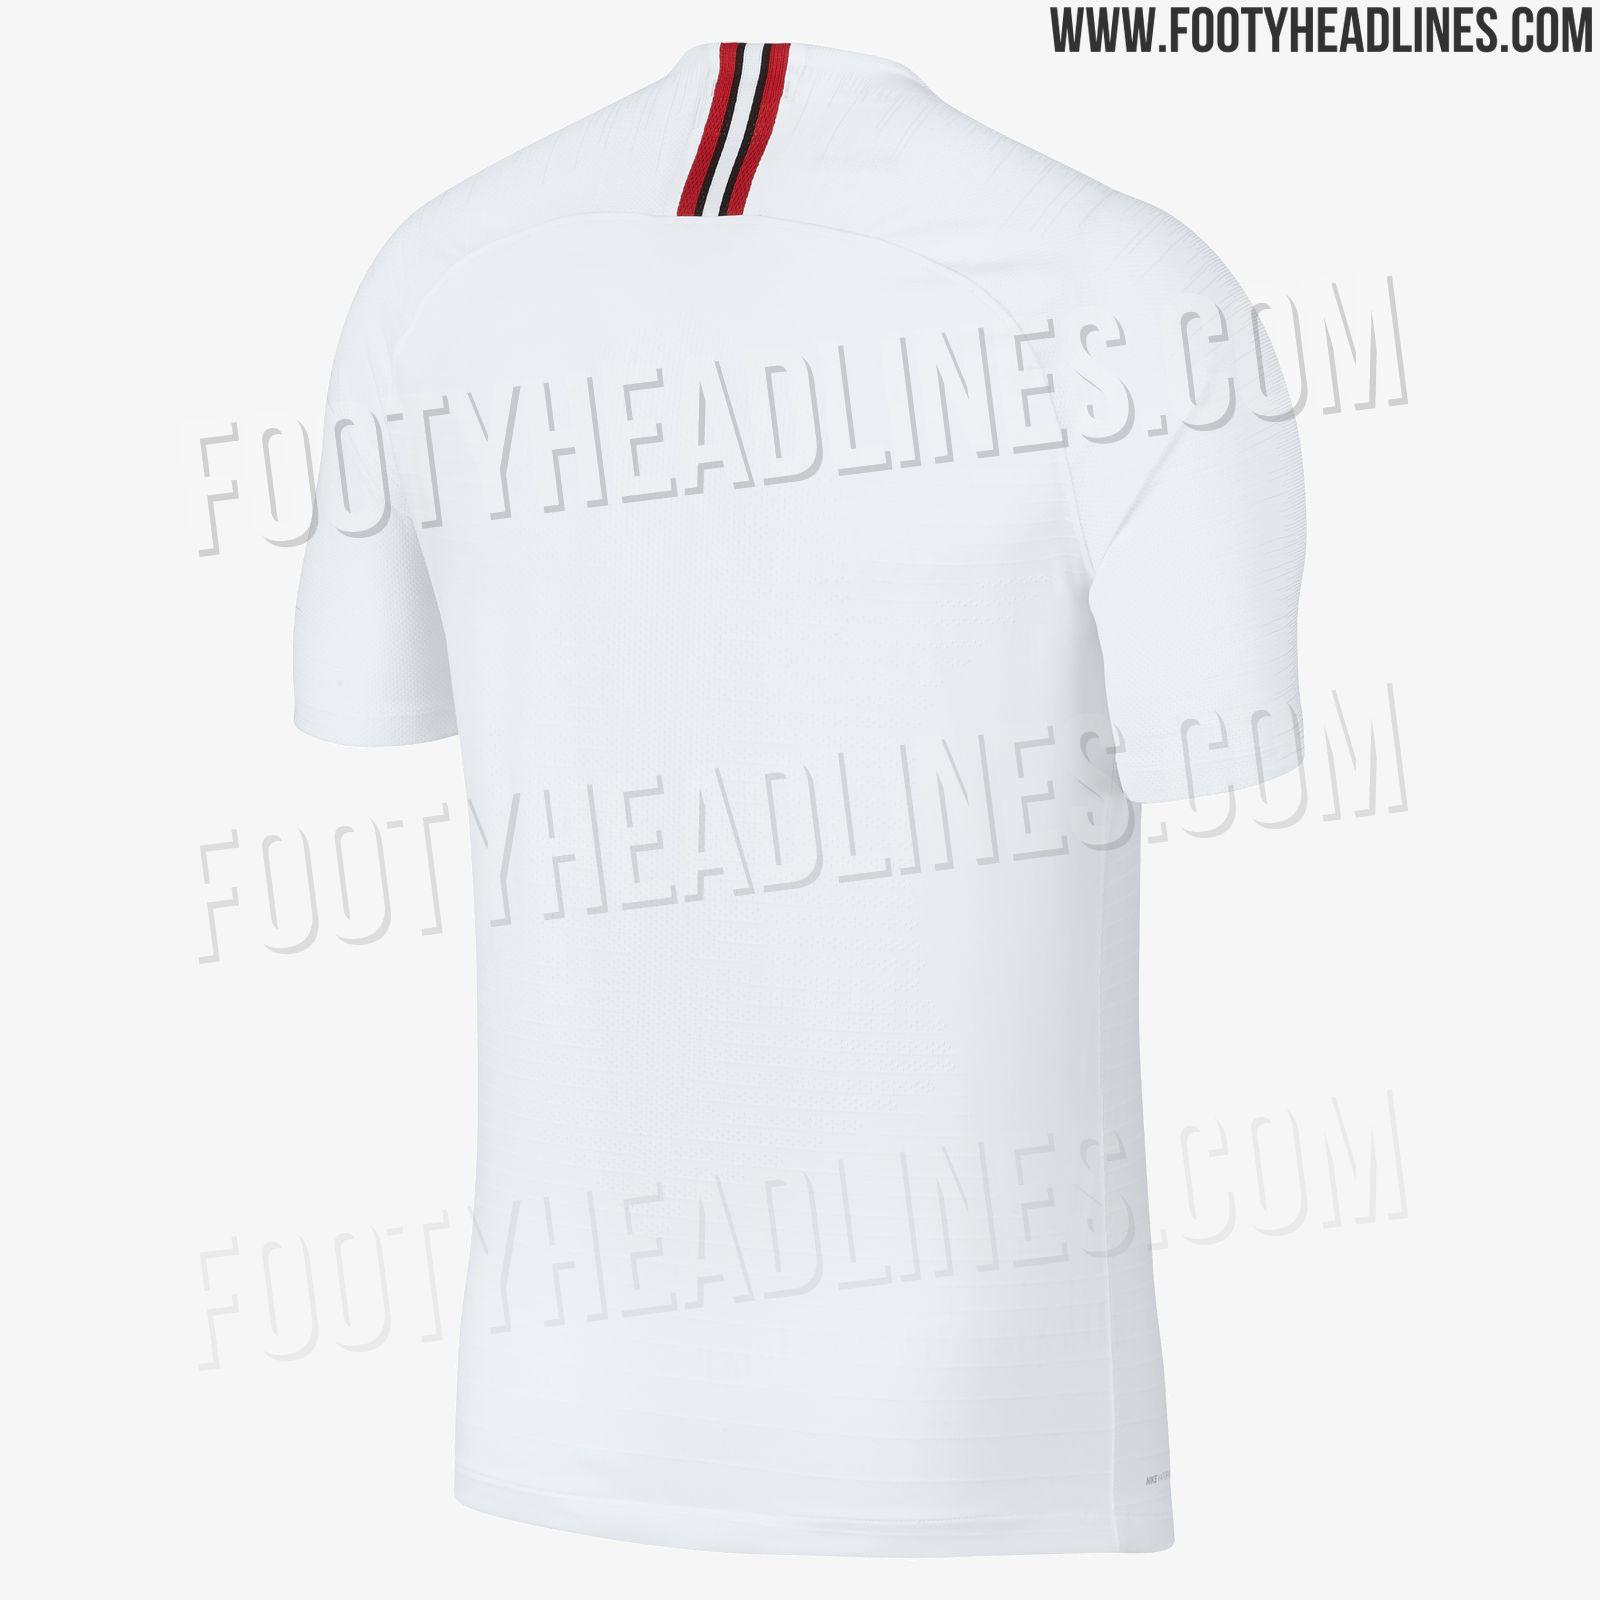 Champions League 4 Matchday Round Season 2018 2019: Jordan PSG 18-19 Champions League Kits Leaked